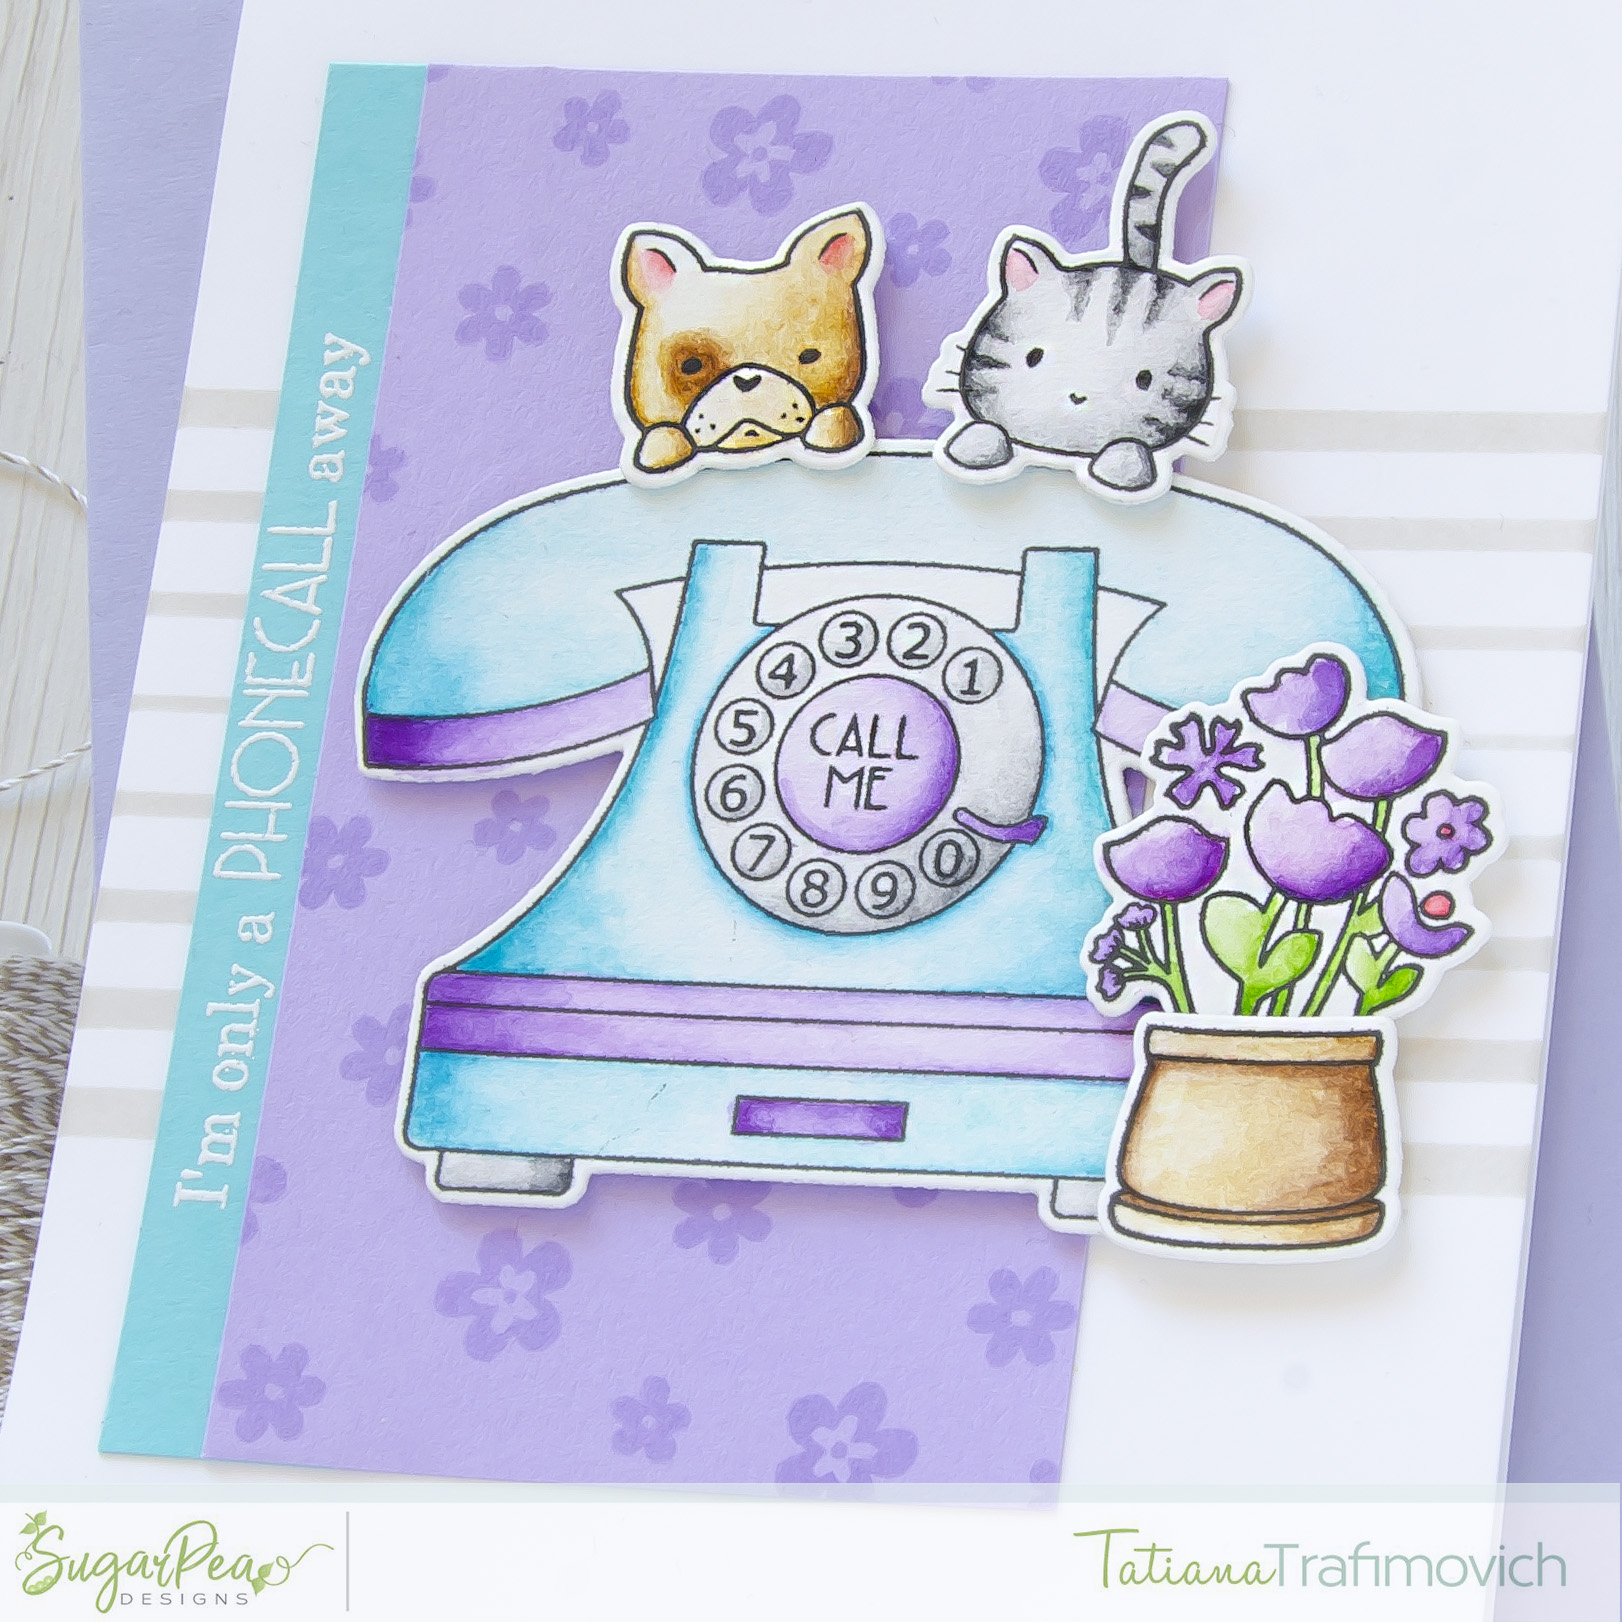 Call Me #handmade card by Tatiana Trafimovich #tatianacraftandart - Call Me Stamp Set by SugarPea Designs #sugarpeadesigns